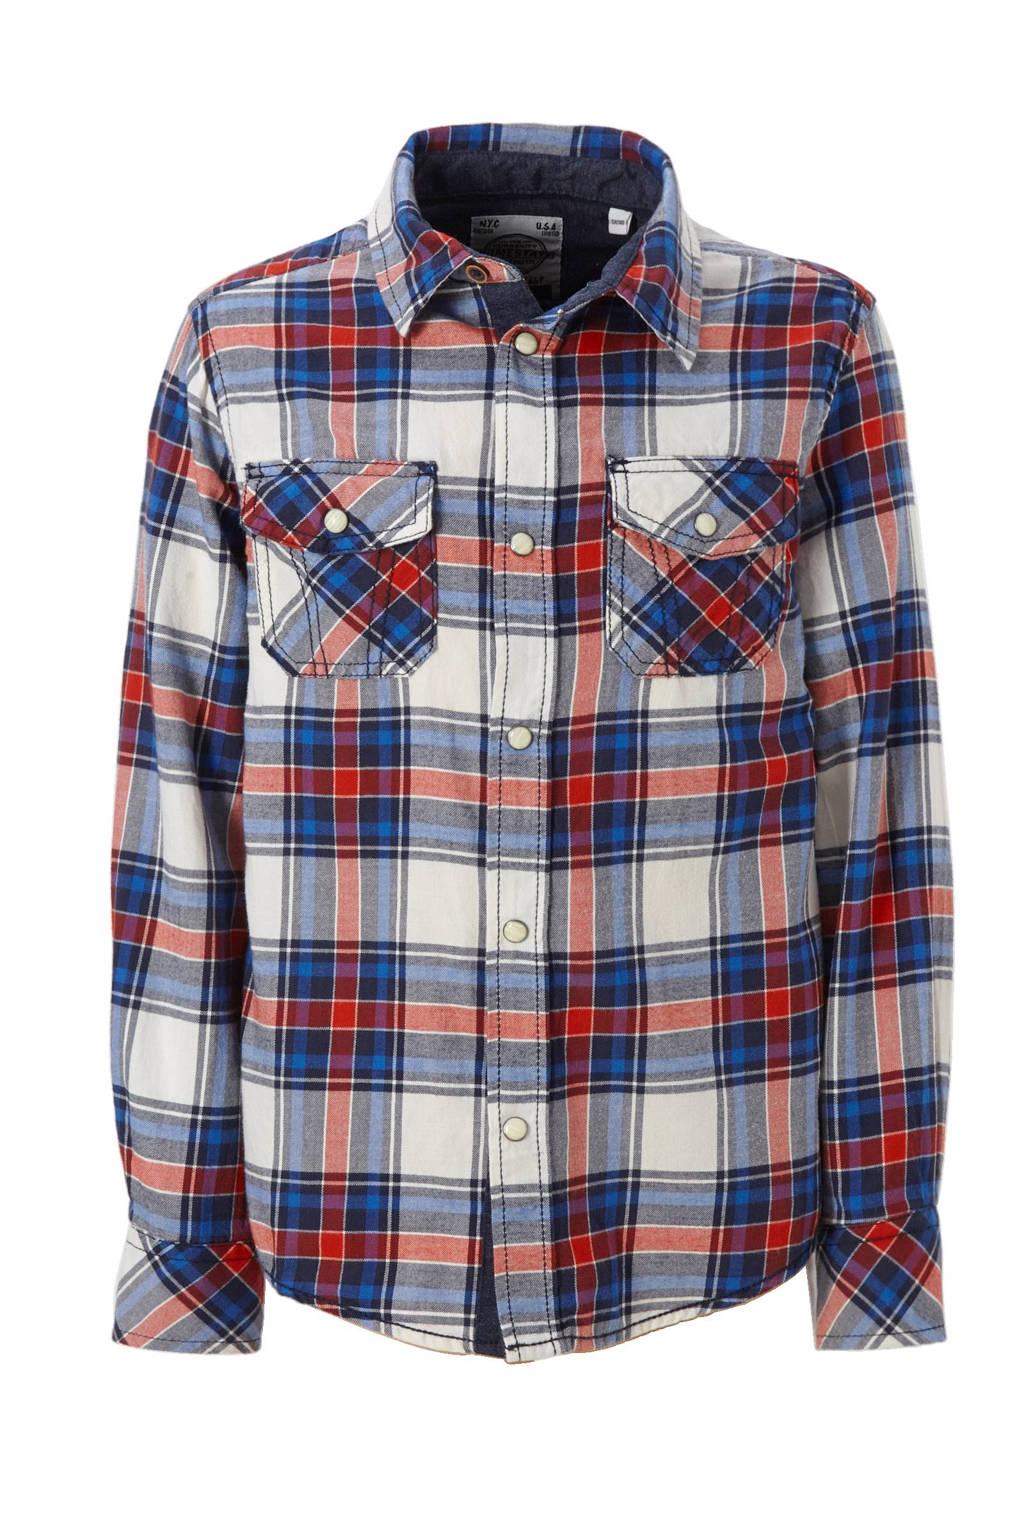 Flanellen Overhemd.C A Here There Flanellen Overhemd Wehkamp